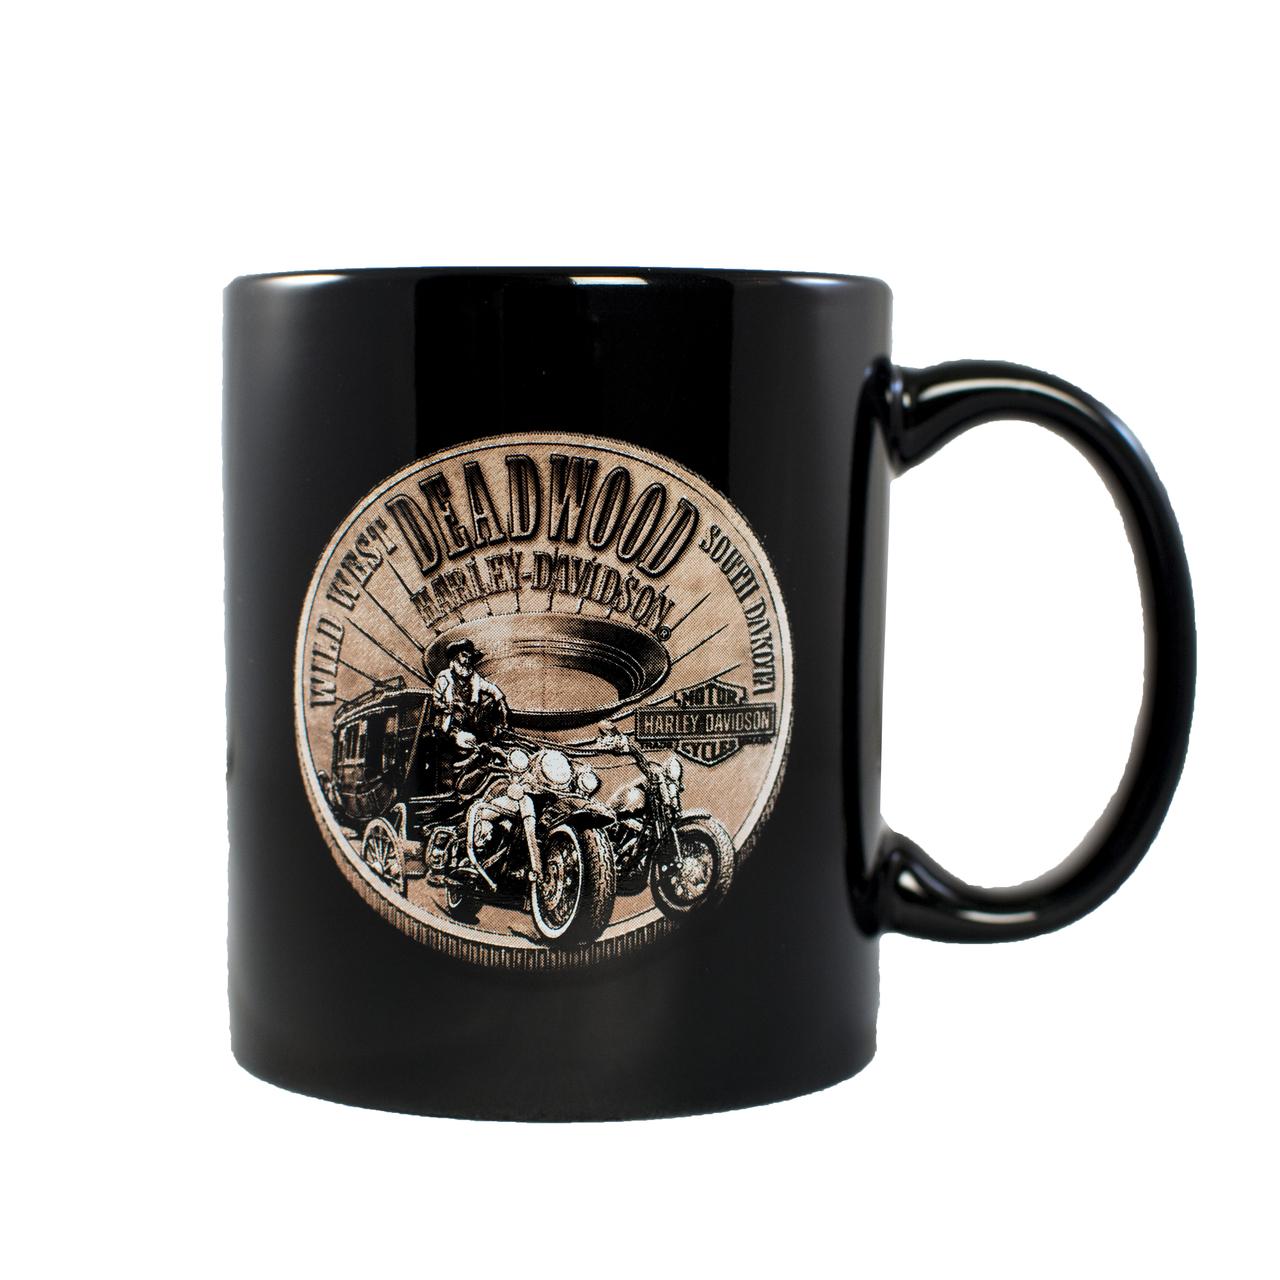 Harley-Davidson Deadwood Vintage Saloon Can Coozie